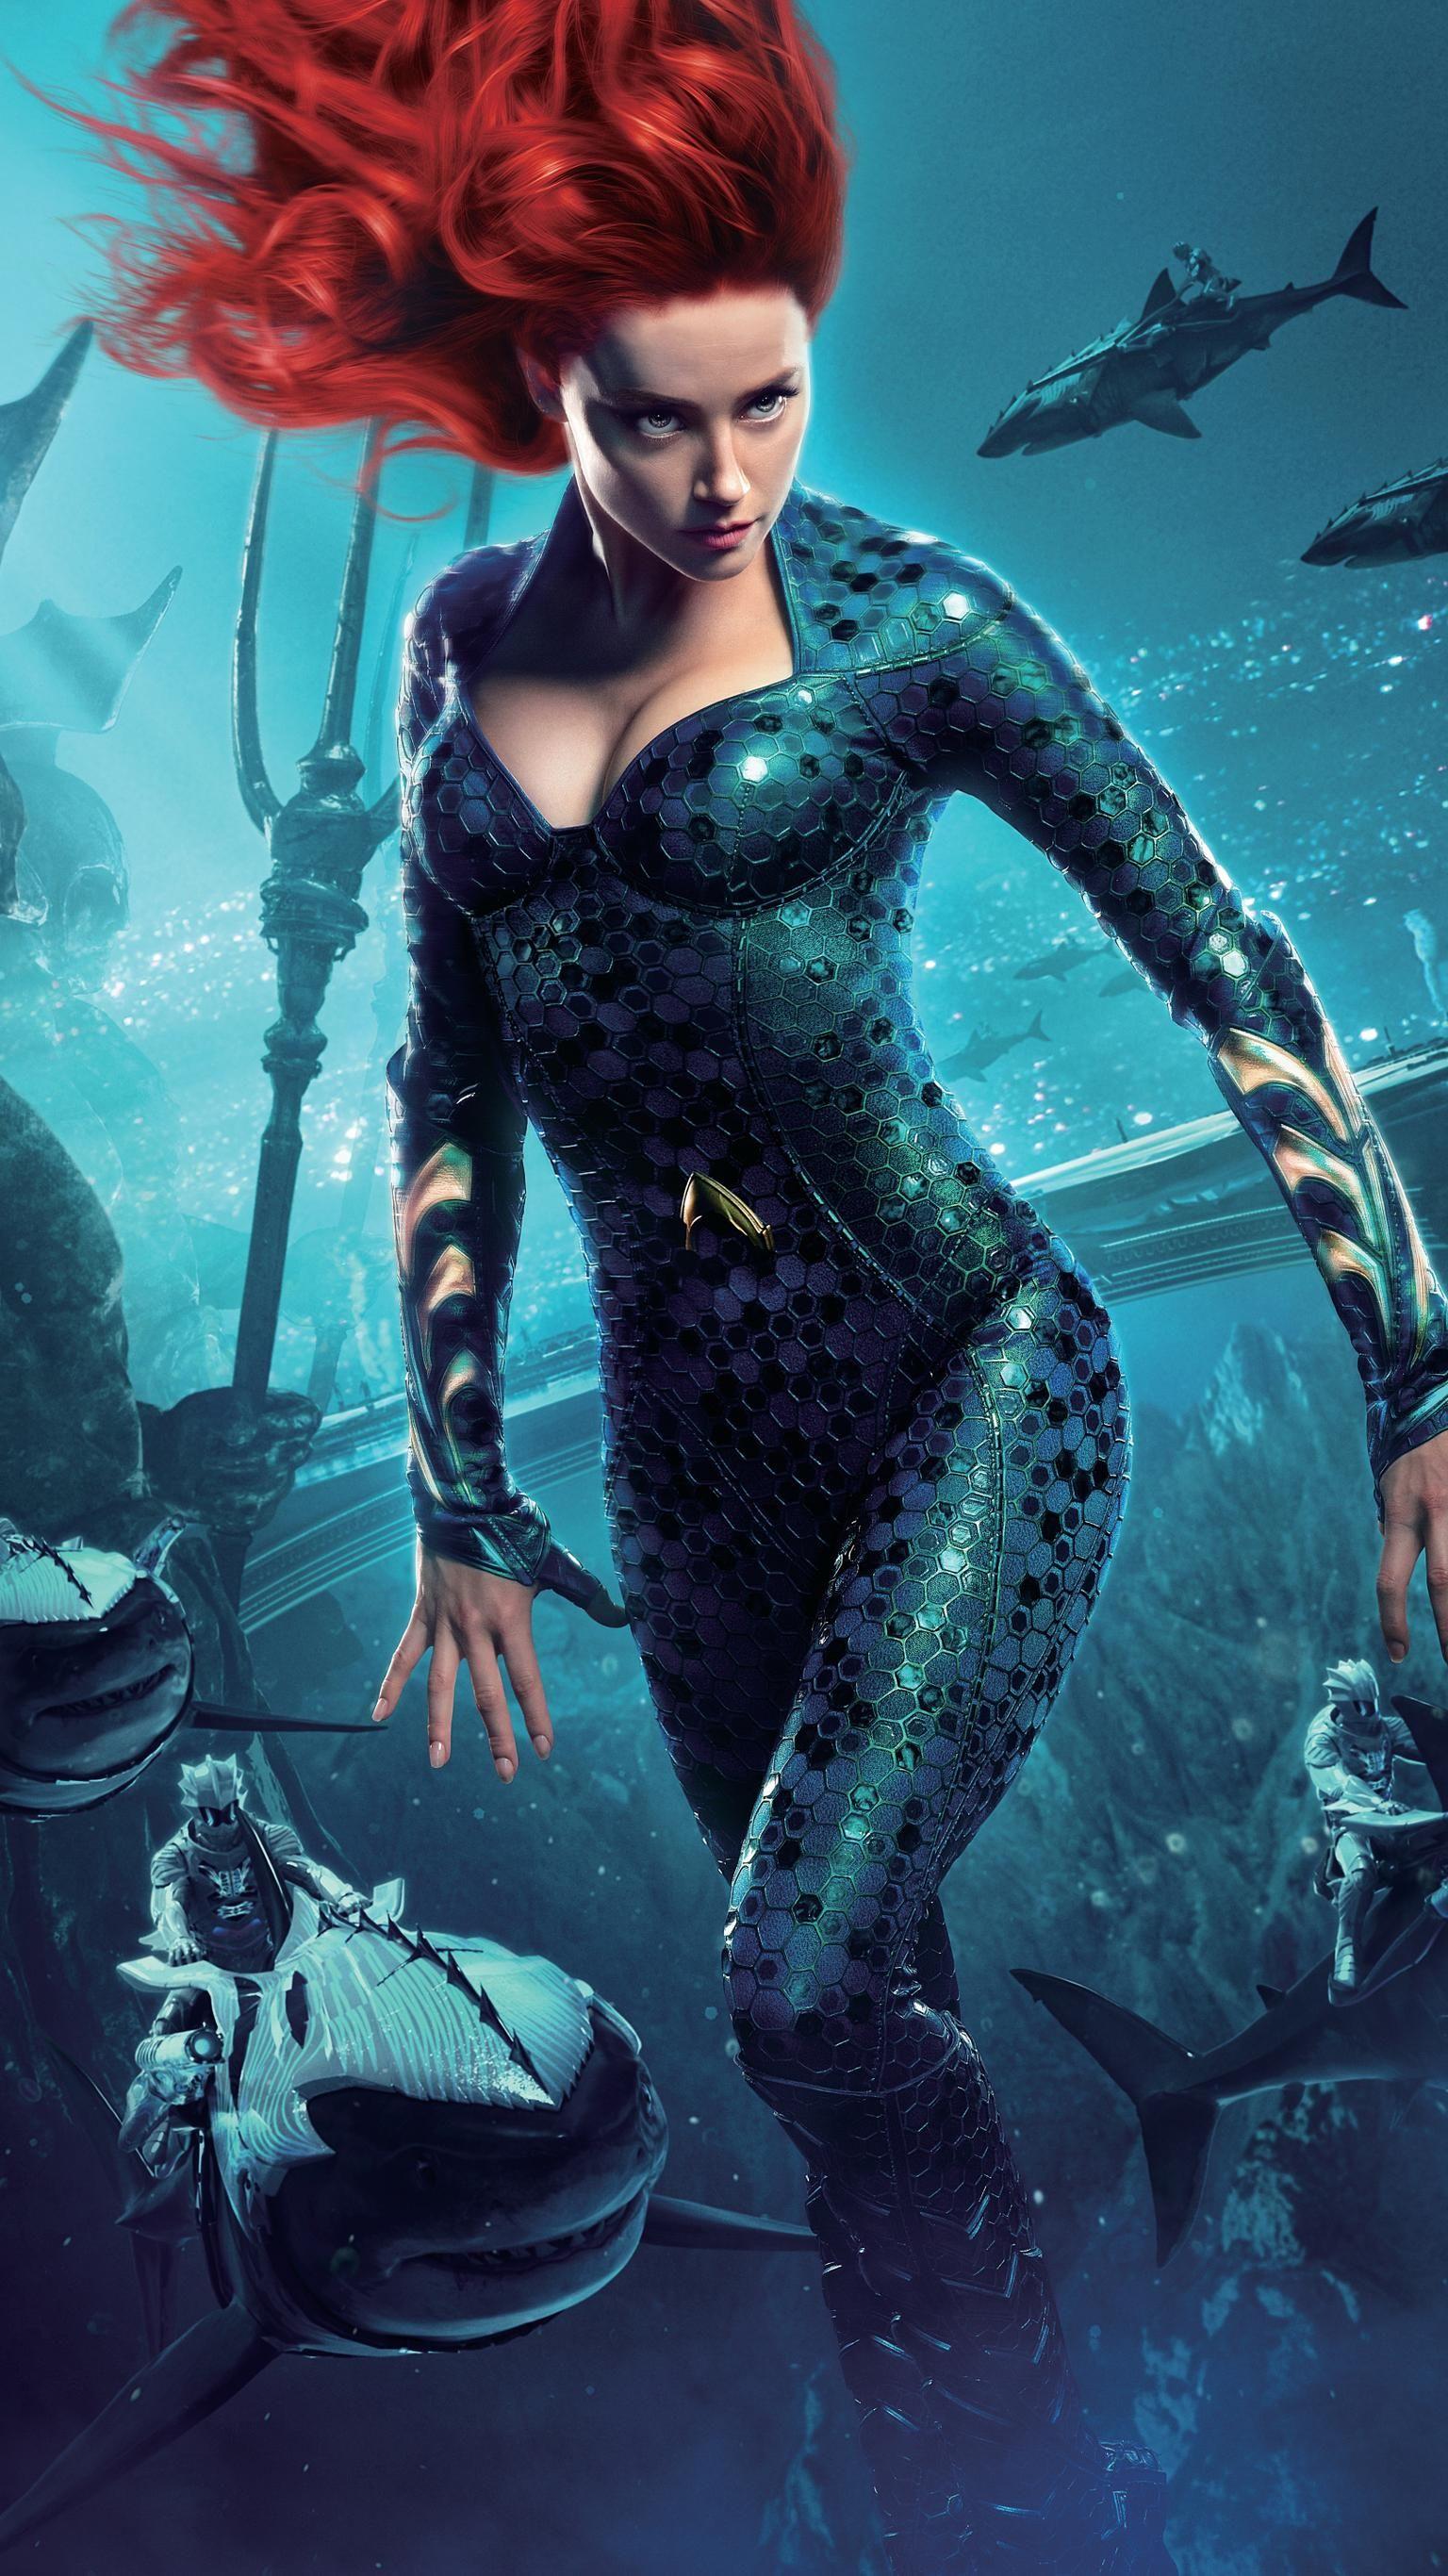 Aquaman (2018) Phone Wallpaper